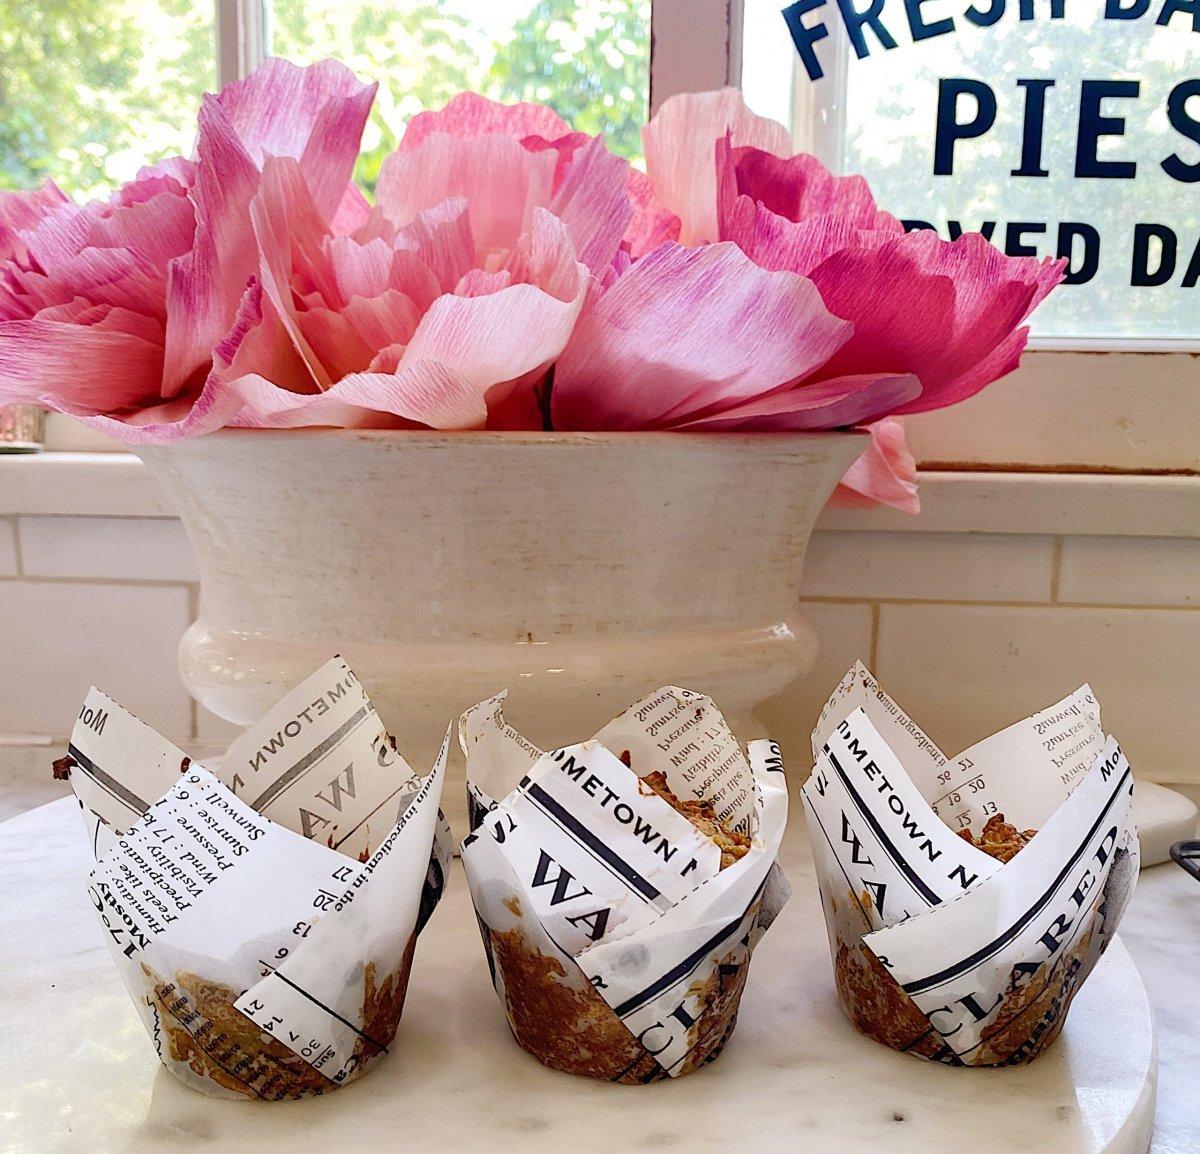 My Favorite Muffins